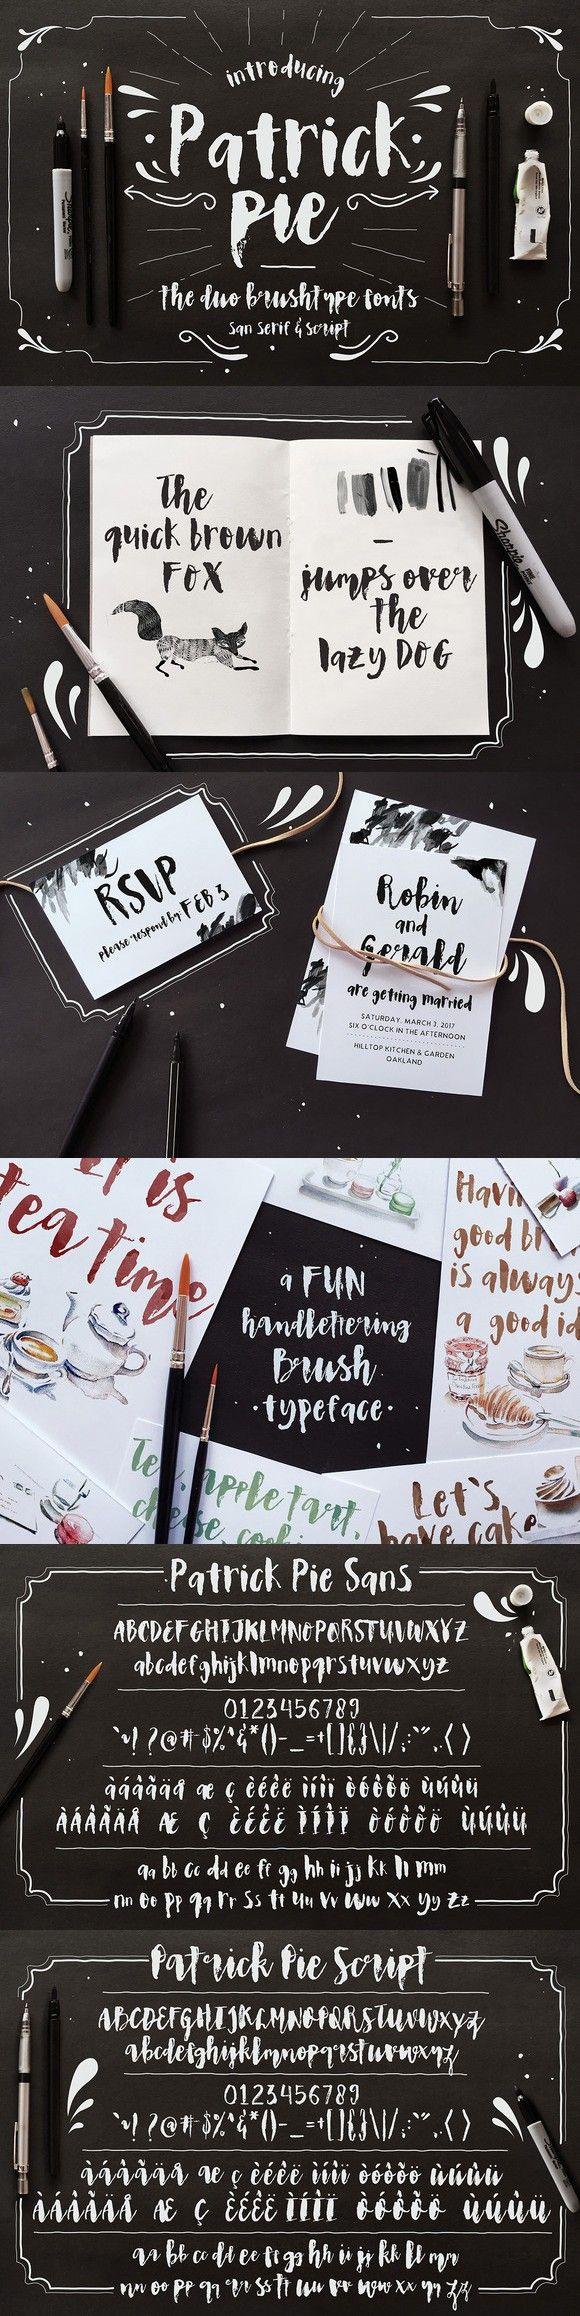 cursive fonts for wedding cards%0A Script Fonts          Wedding Card